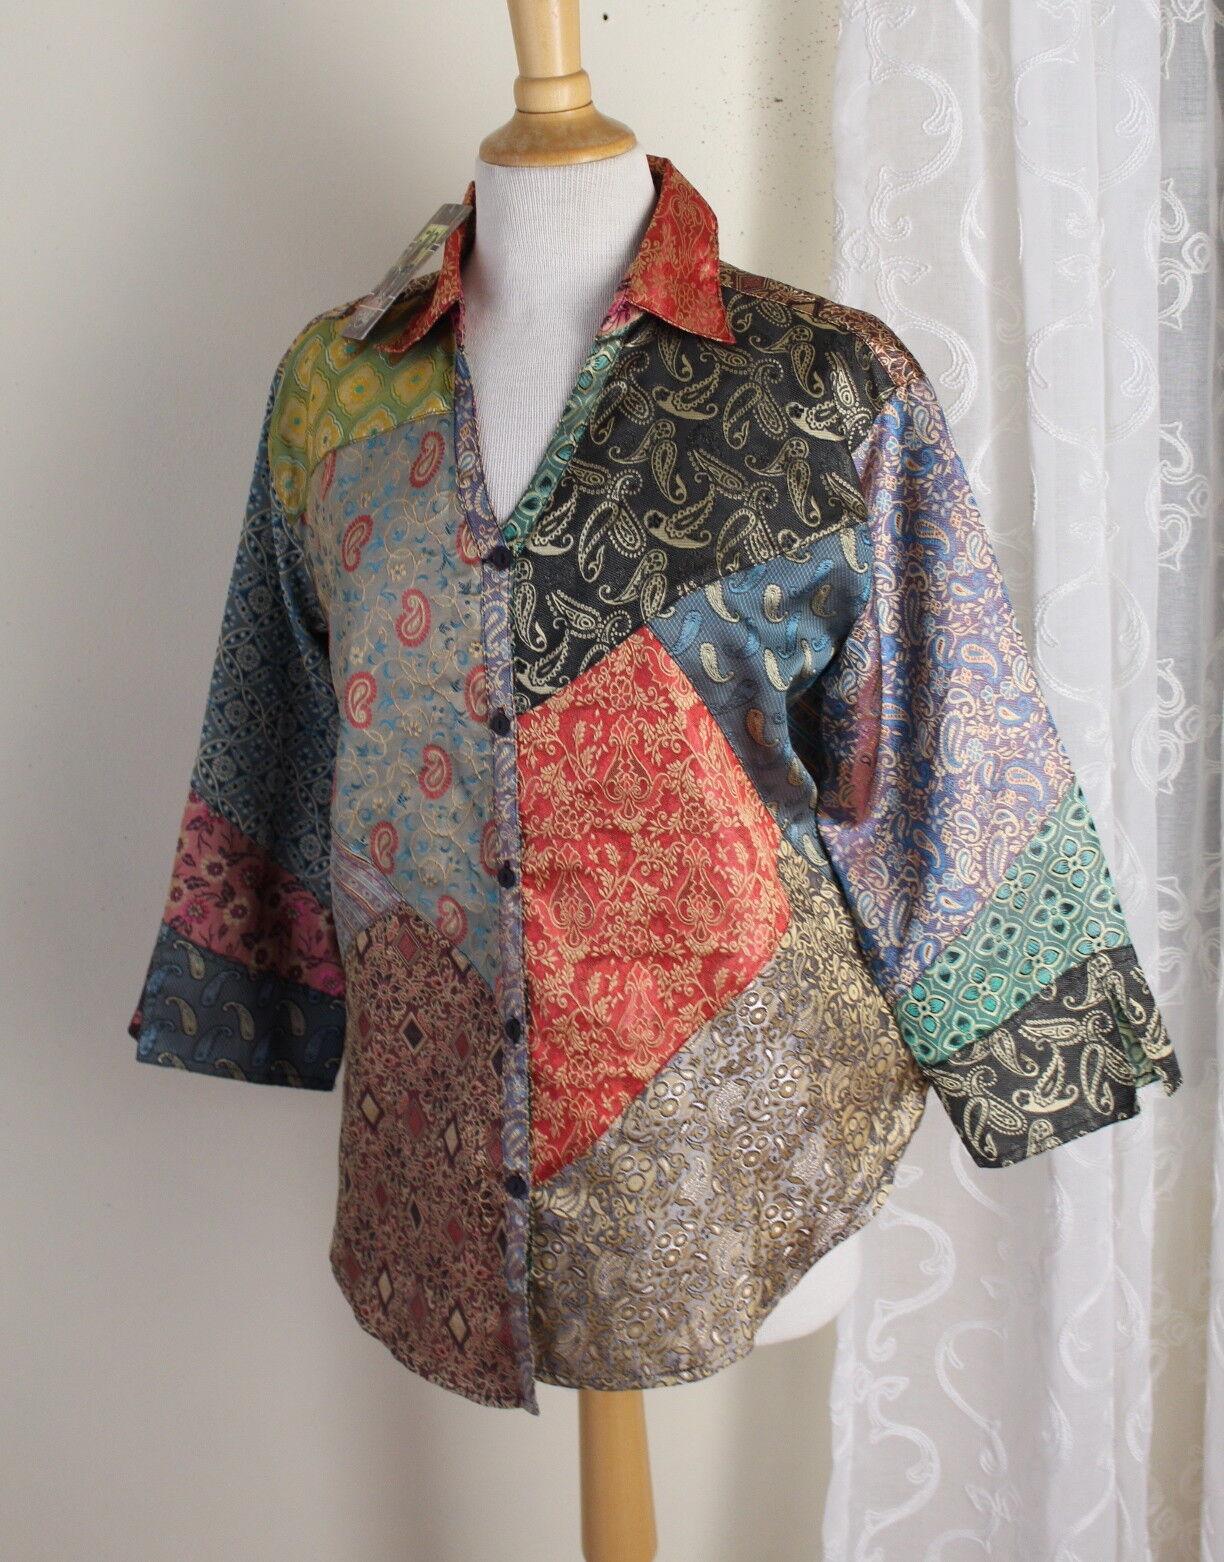 NWT Sacrot Threads Sz M Art-to-Wear Fun Boho Gypsy Paisley Patchwork Tunic Top